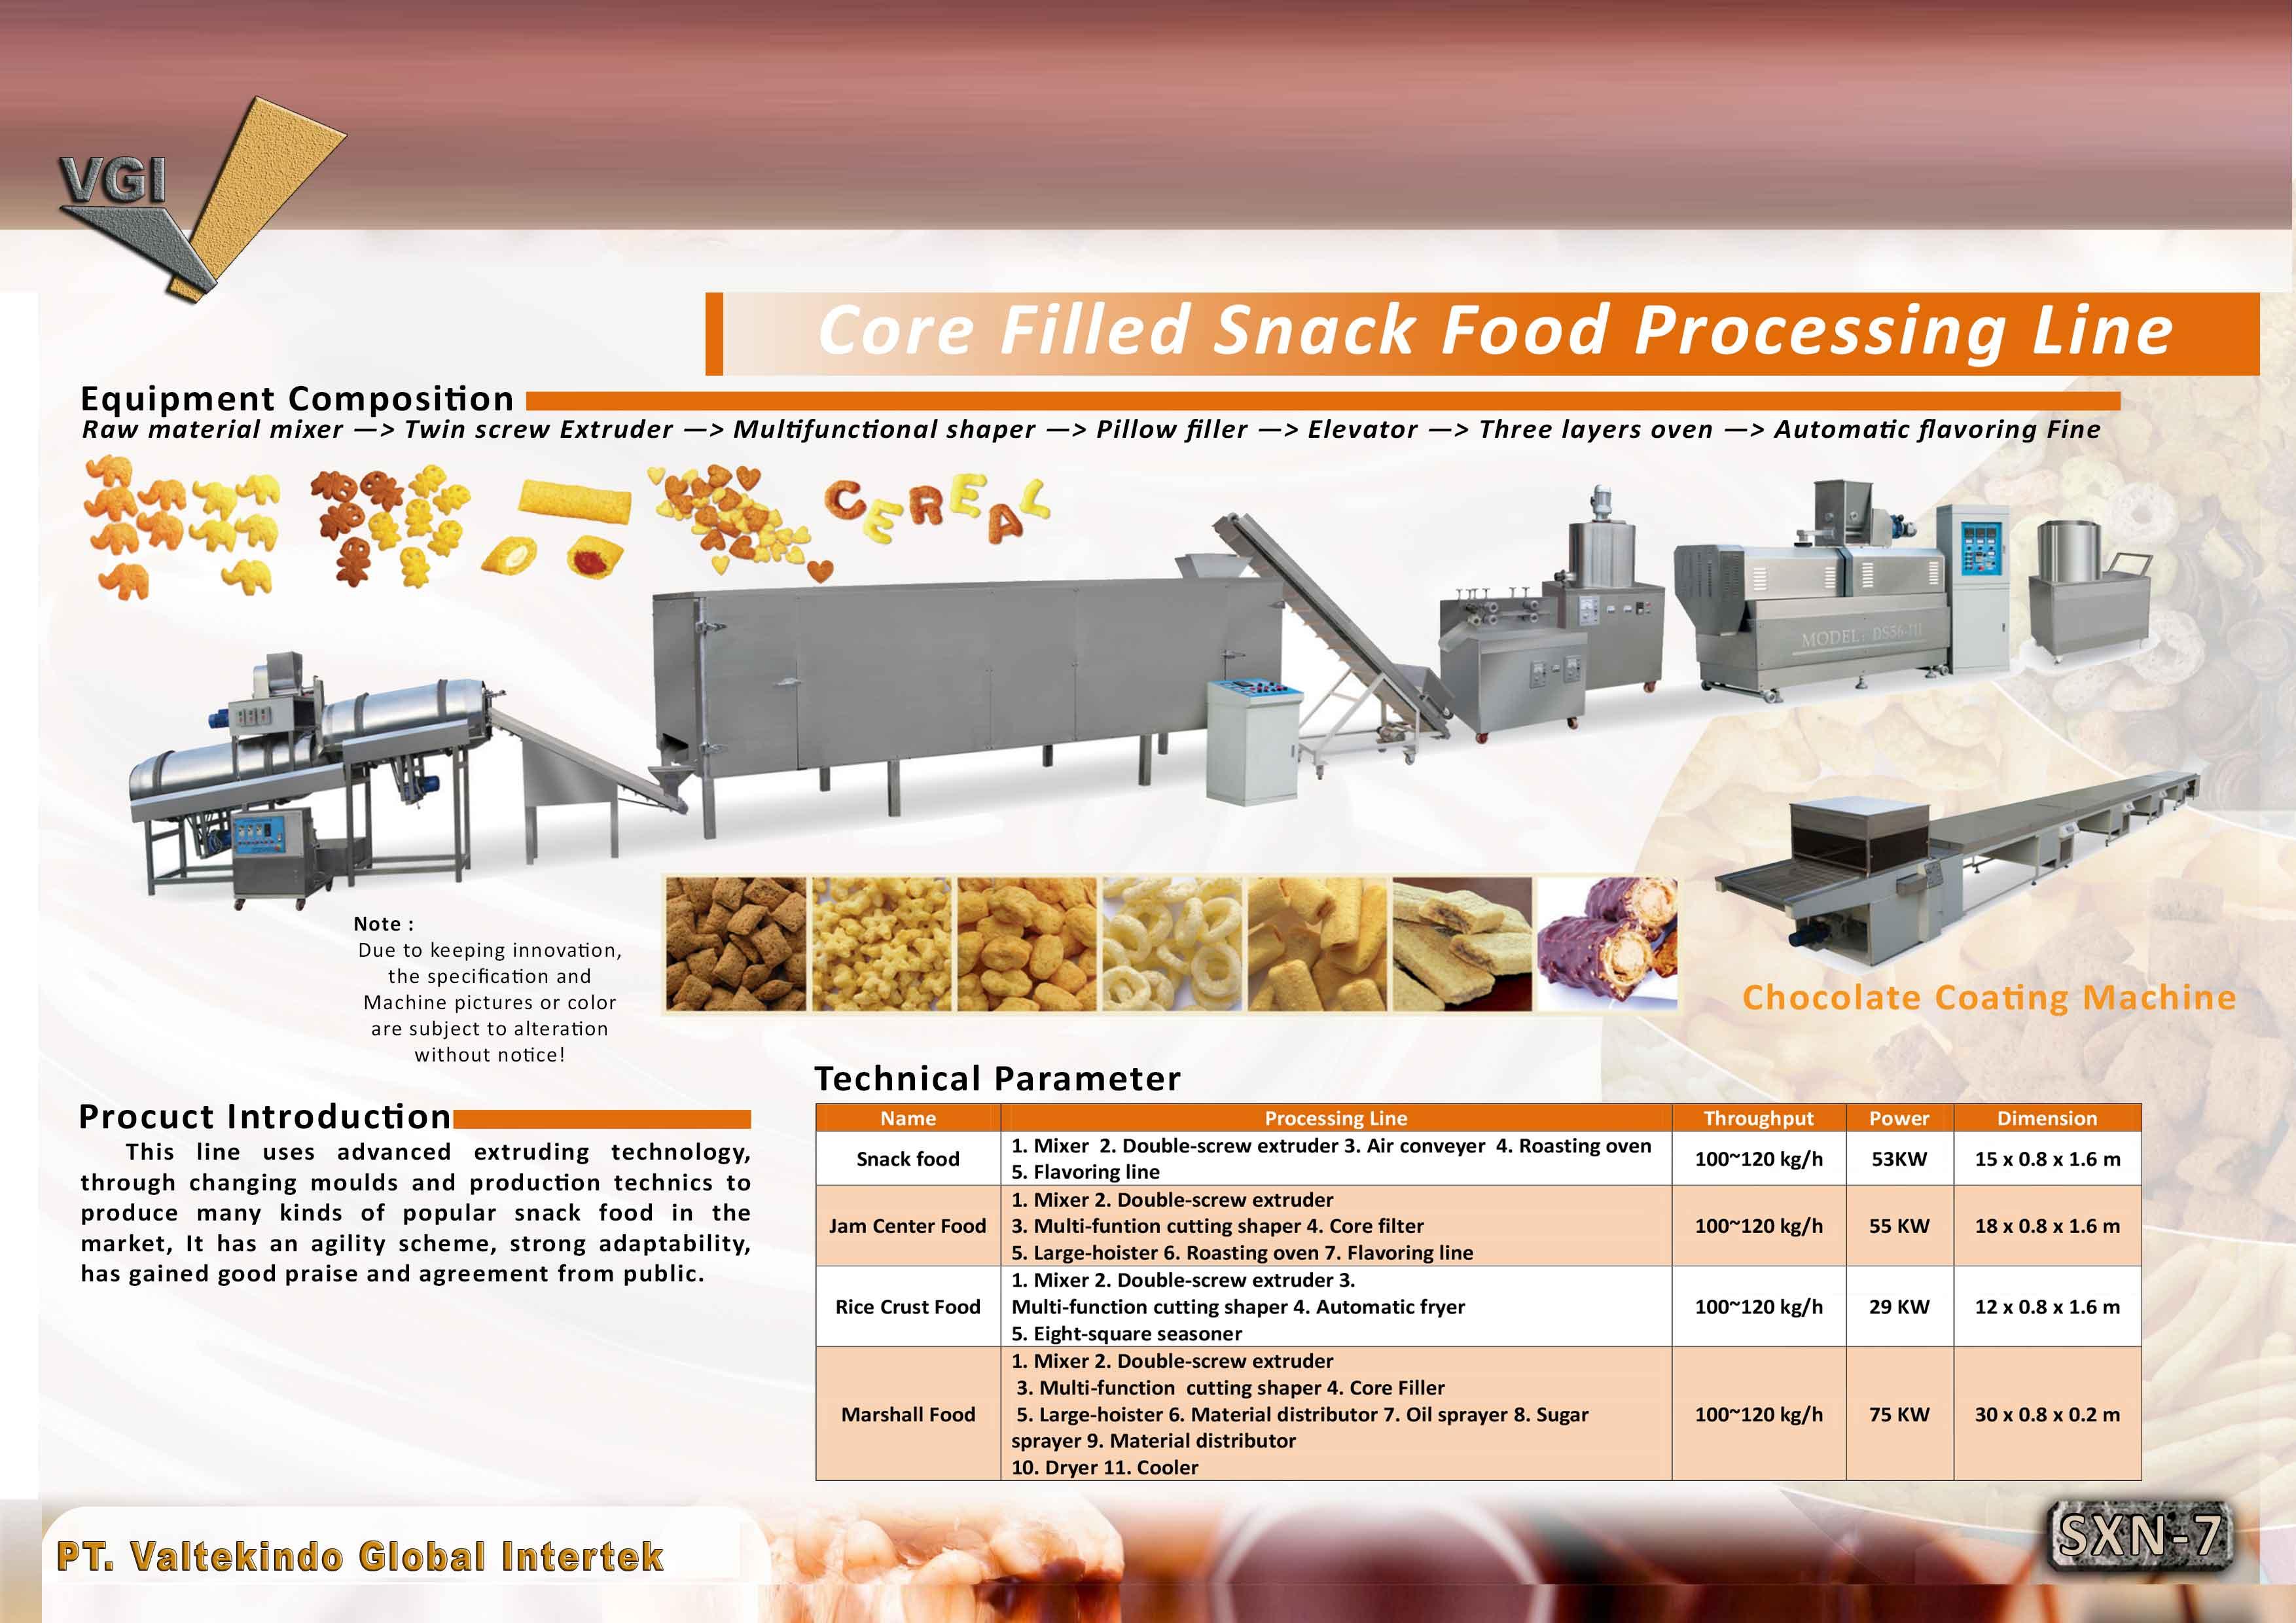 jual mesin Core Filled Snack Food Processing  Core Filled Snack Food Processing